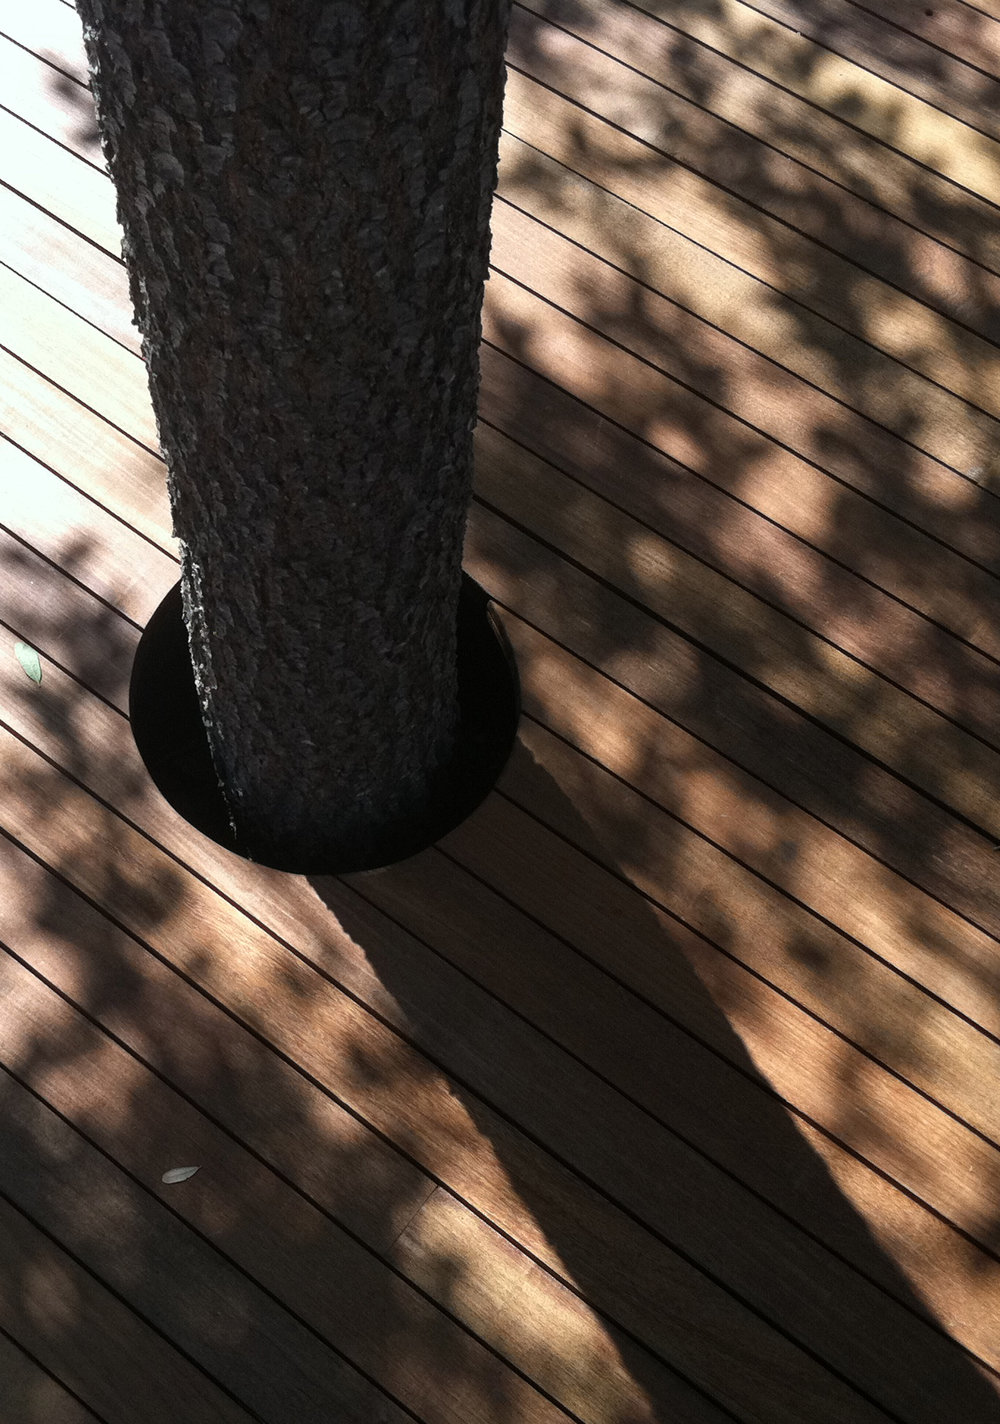 treehole.jpg